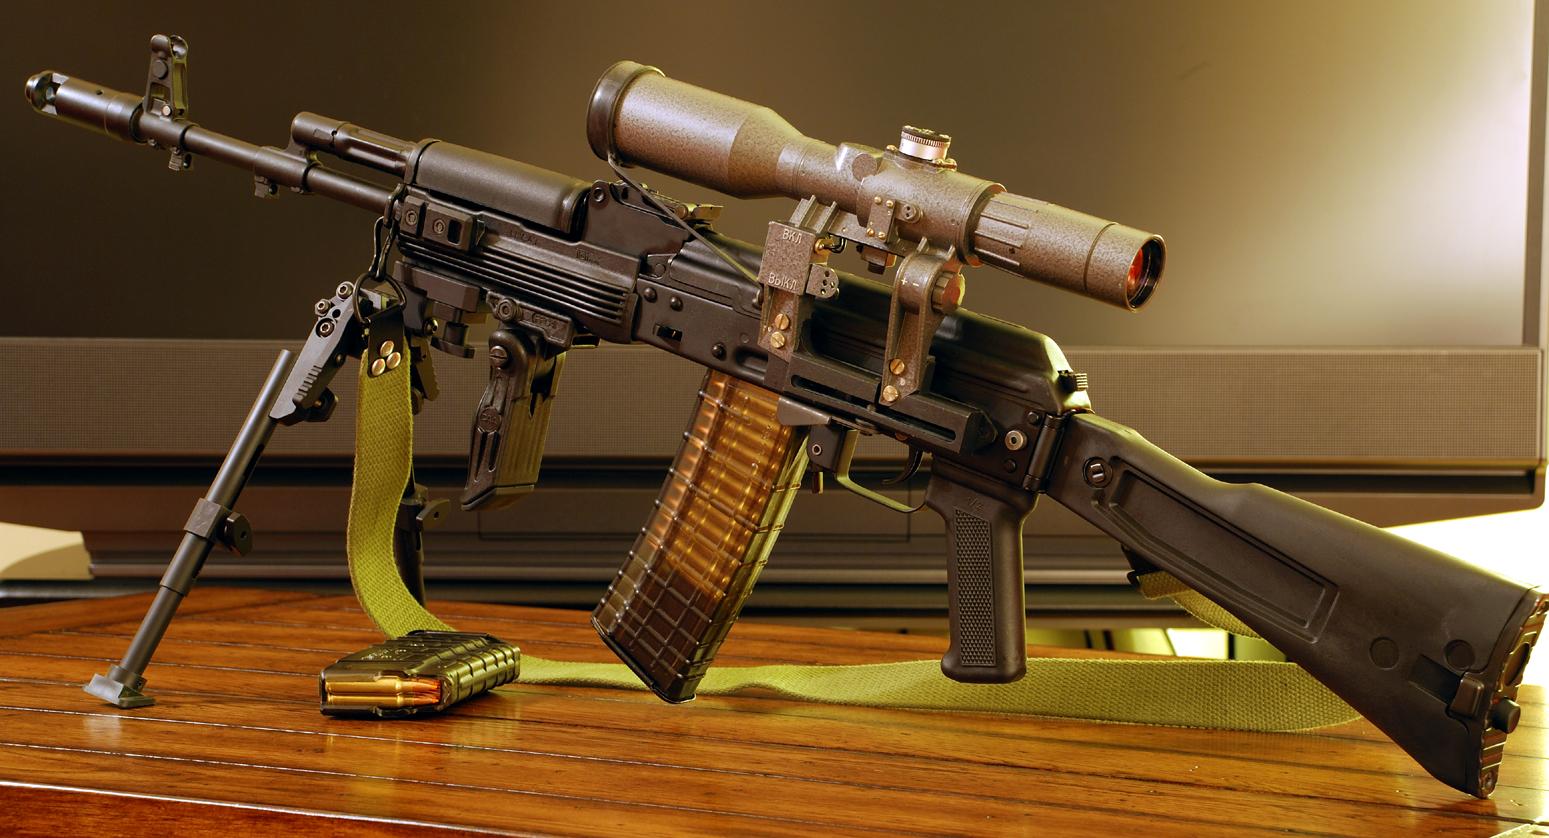 Rifles Of Russian Army Hd Wallpaper: Guns & Weapons: Cool Guns Wallpapers #3